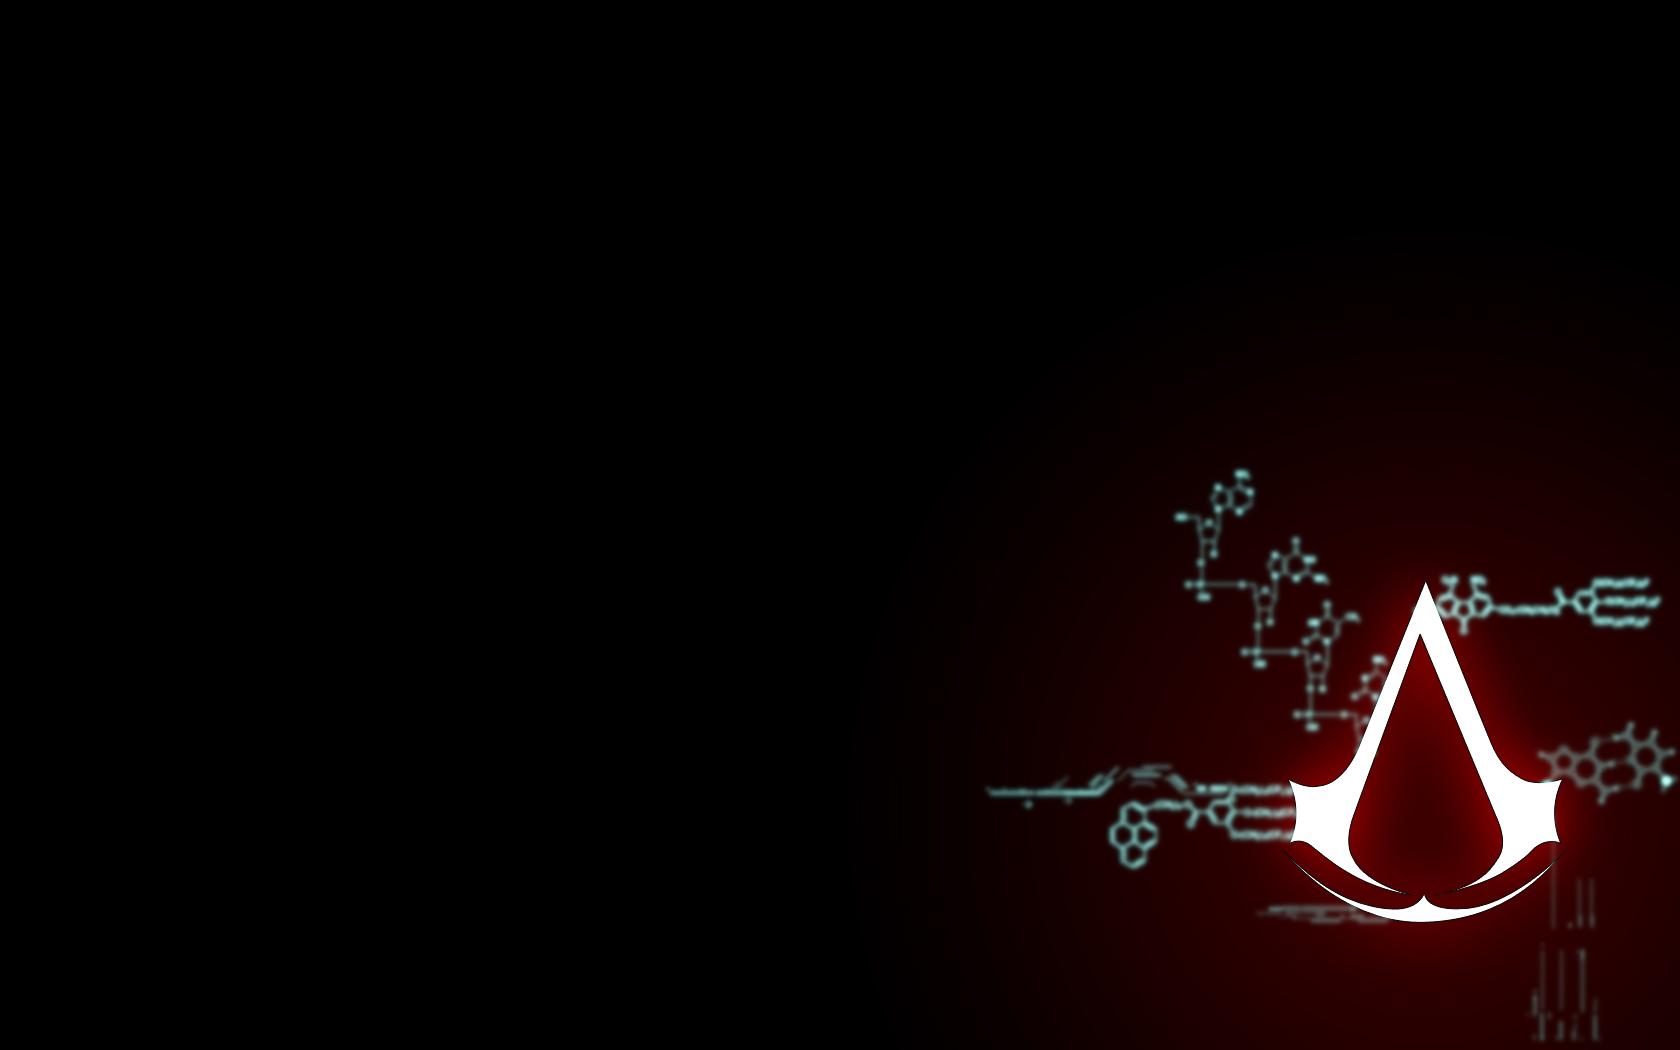 46 Assassin S Creed Symbol Desktop Wallpaper On Wallpapersafari